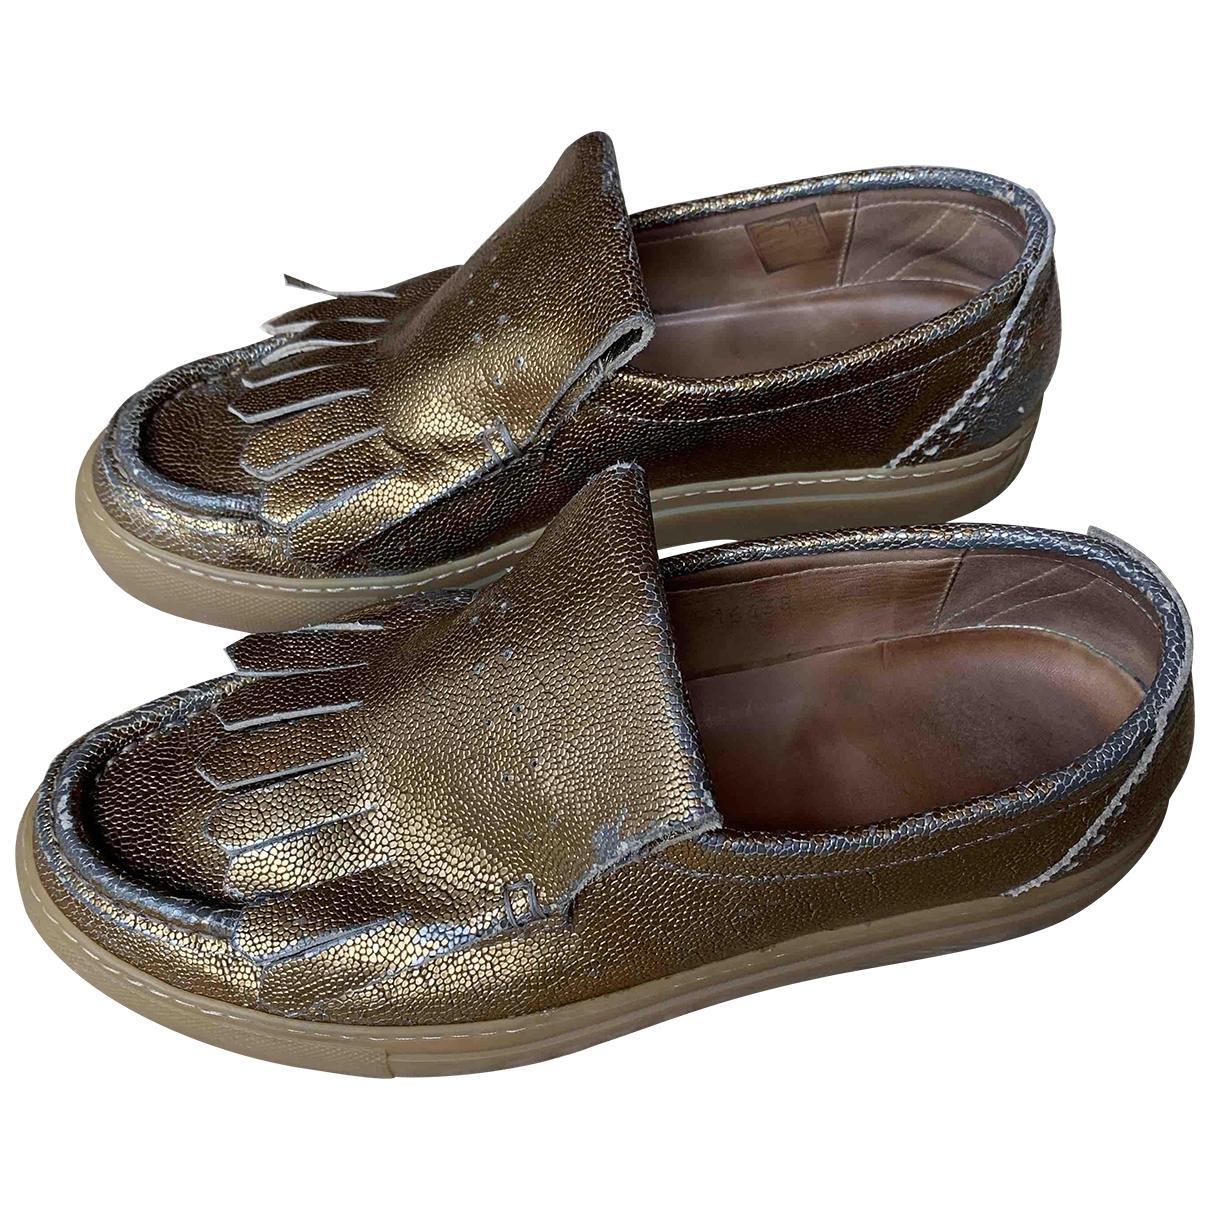 Dries Van Noten \N Gold Leather Flats for Women 40 EU